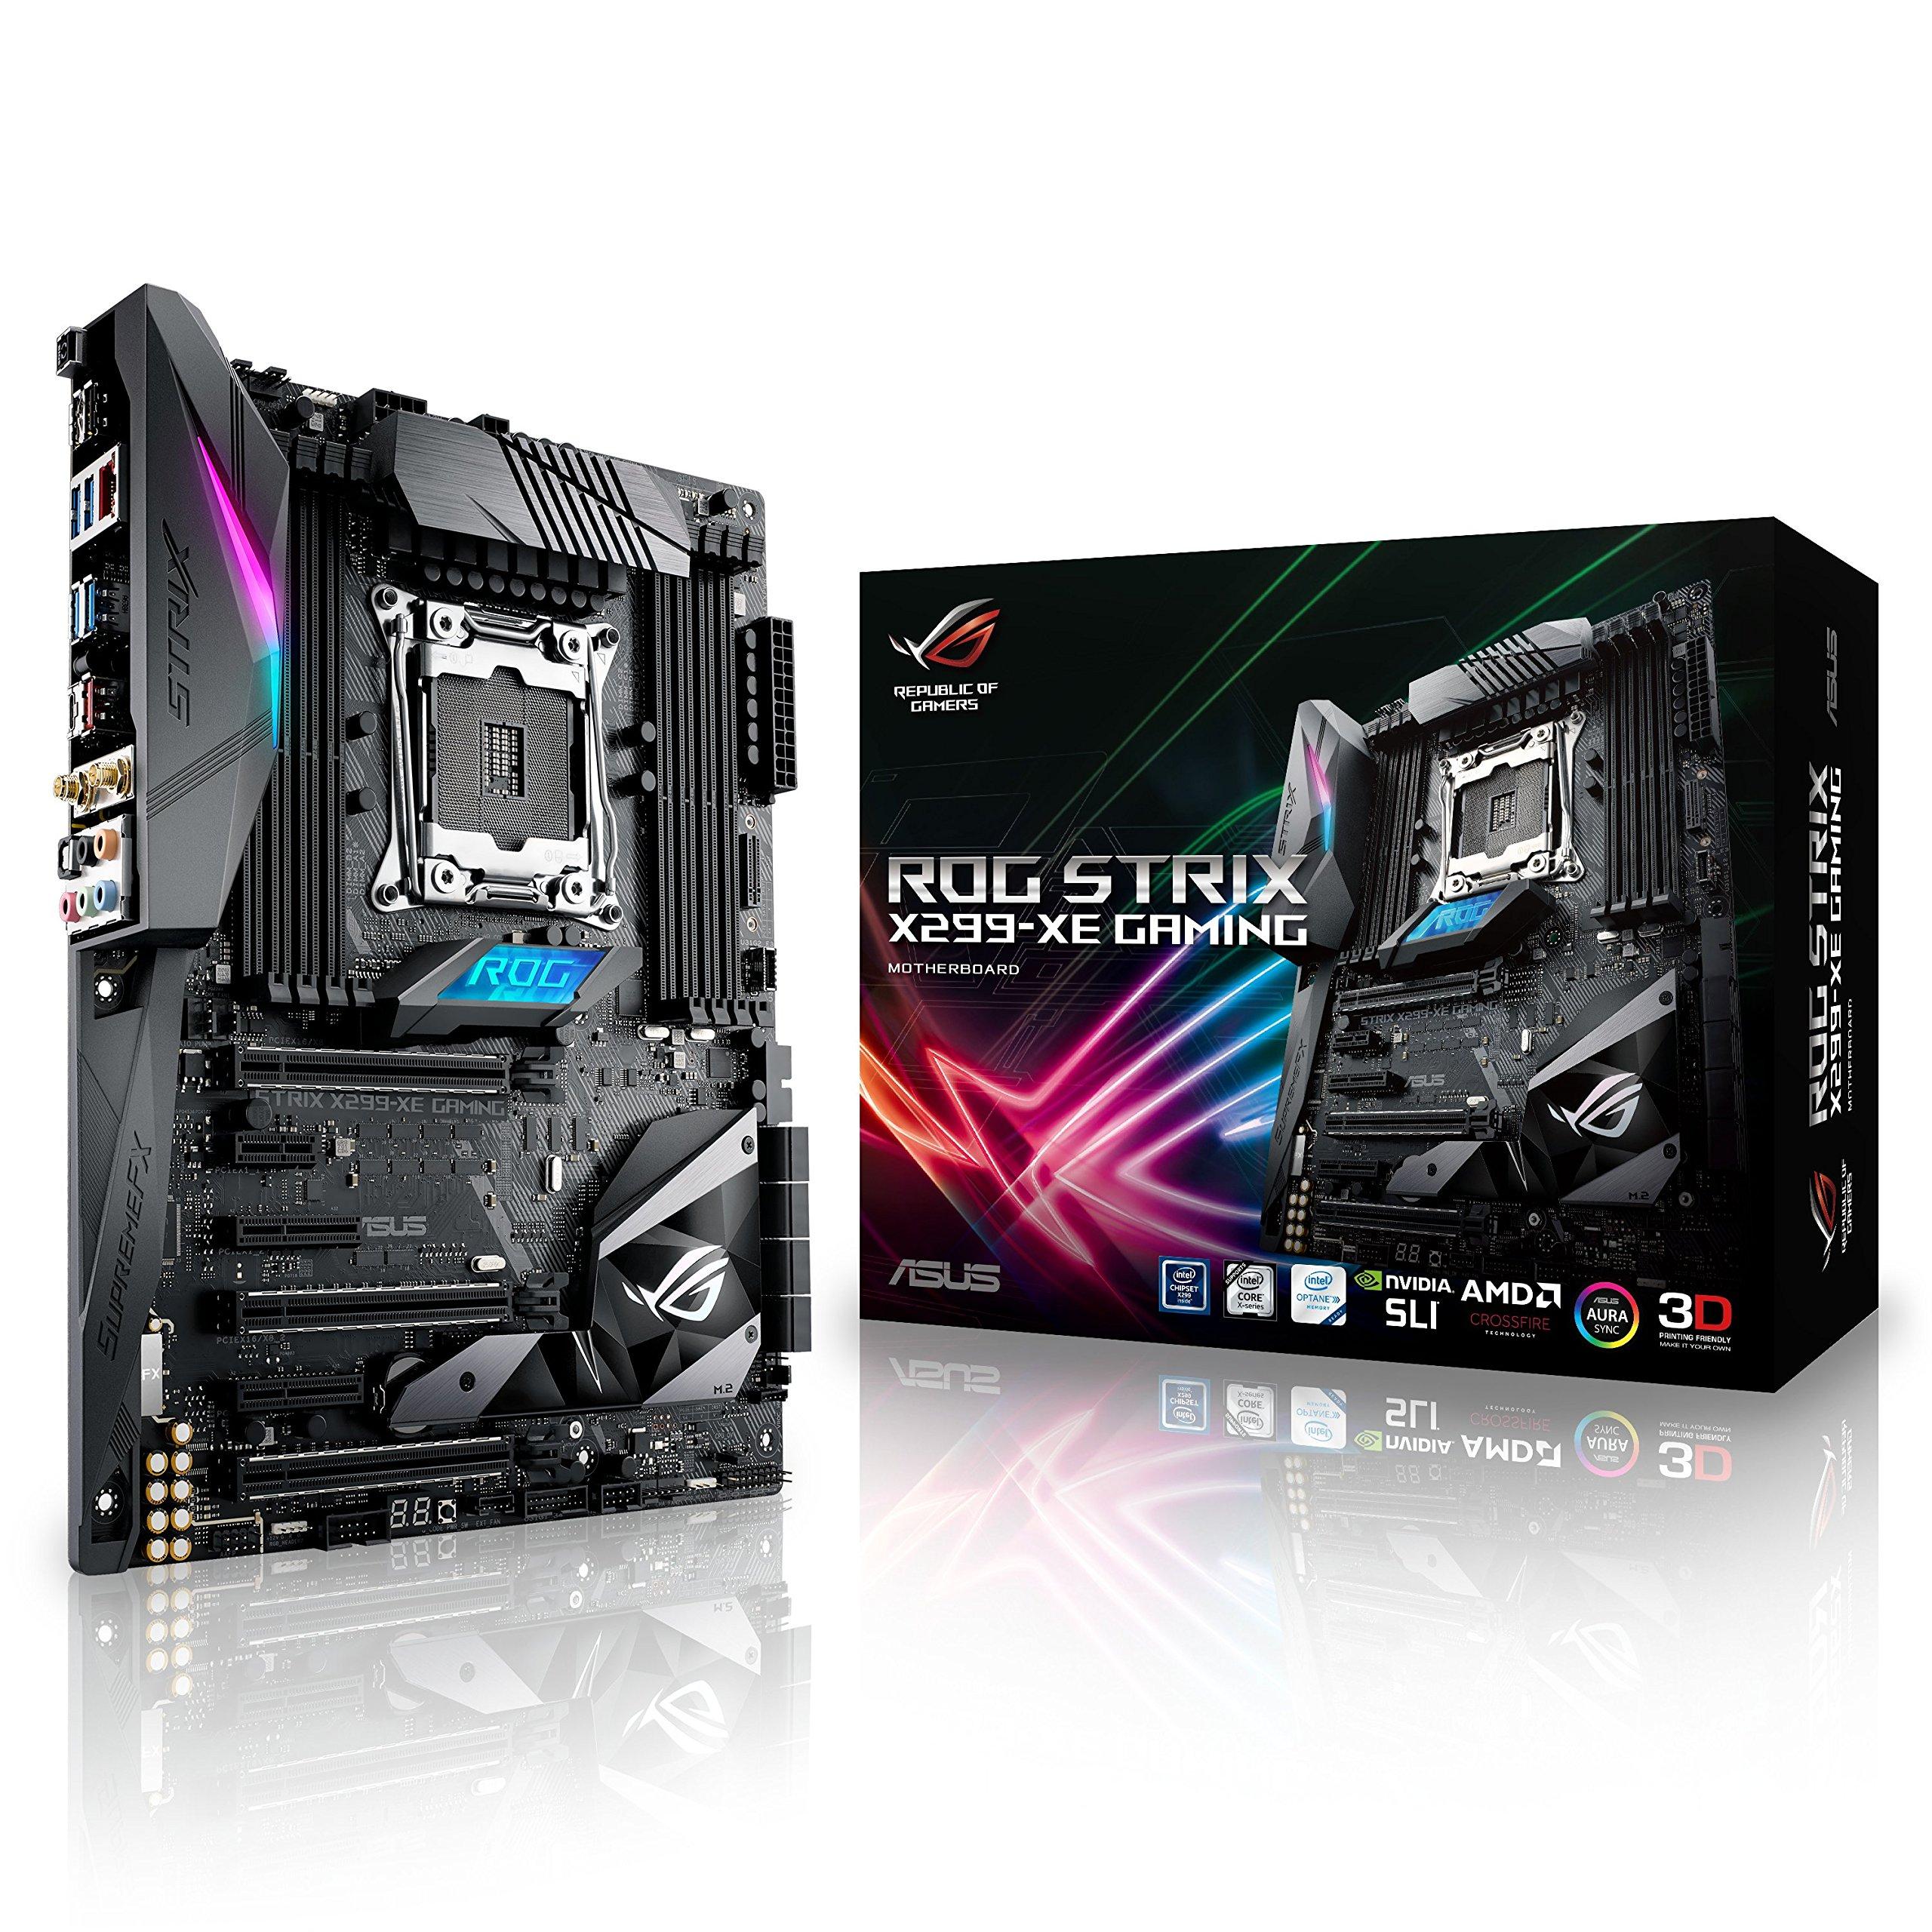 Asus Intel X299 ATX - Placa base gaming con Aura Sync RGB iluminación LED, 802.11ac Wi-Fi, DDR4 4133MHz, dual M.2, SATA 6Gbps y USB 3.1 type - A/C: Amazon.es: Informática